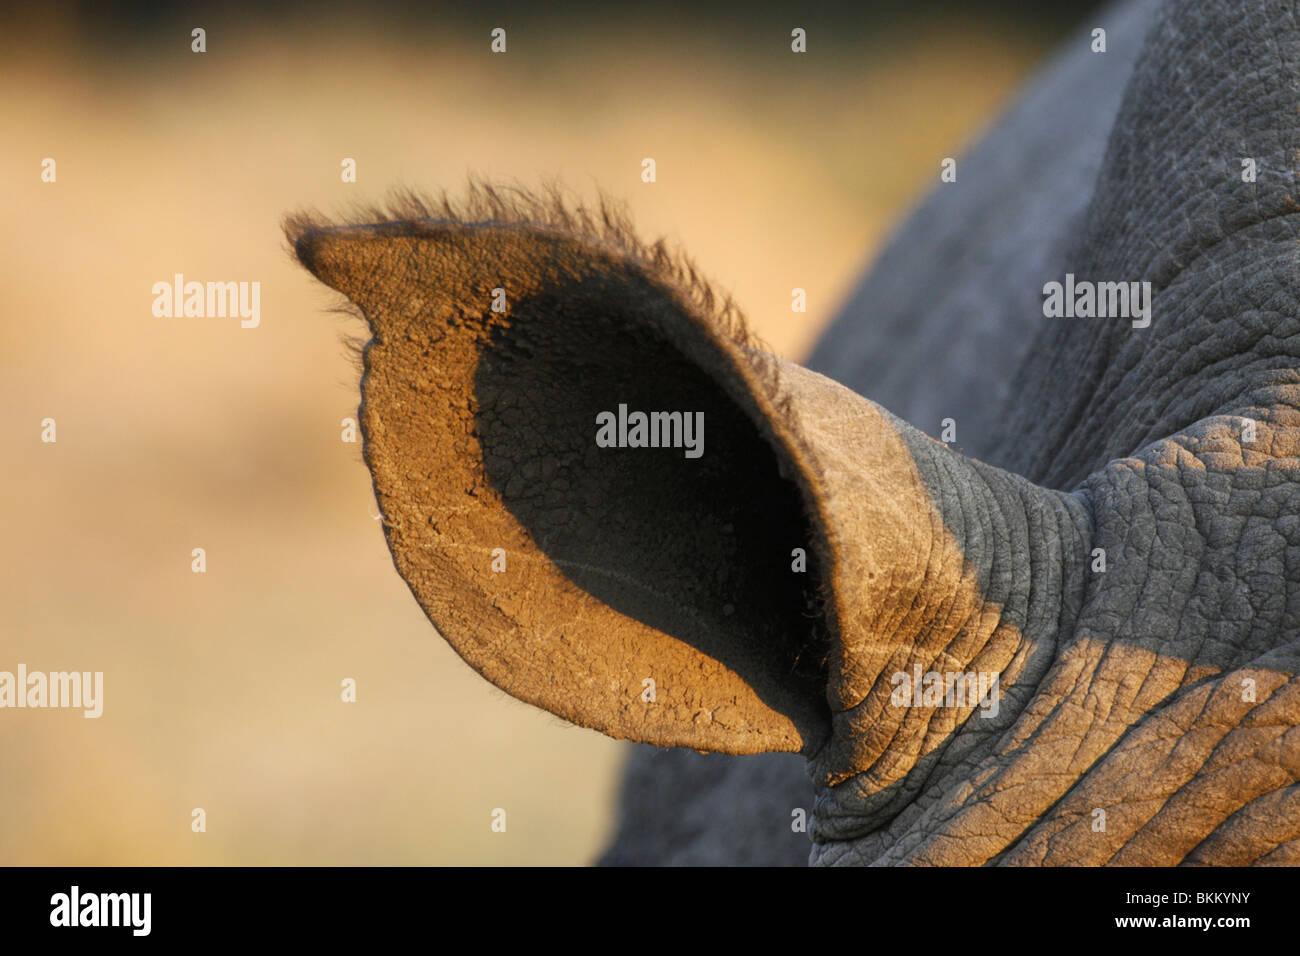 white, rhino ear, South Africa - Stock Image